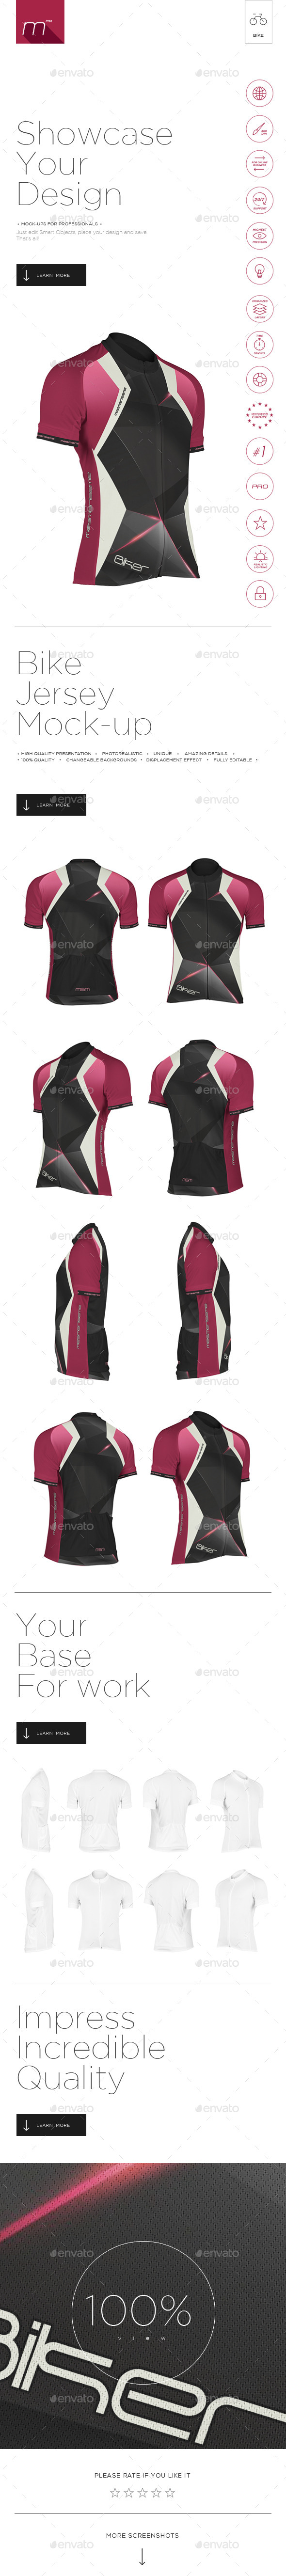 GraphicRiver Bike Jersey Mock-up 11499170